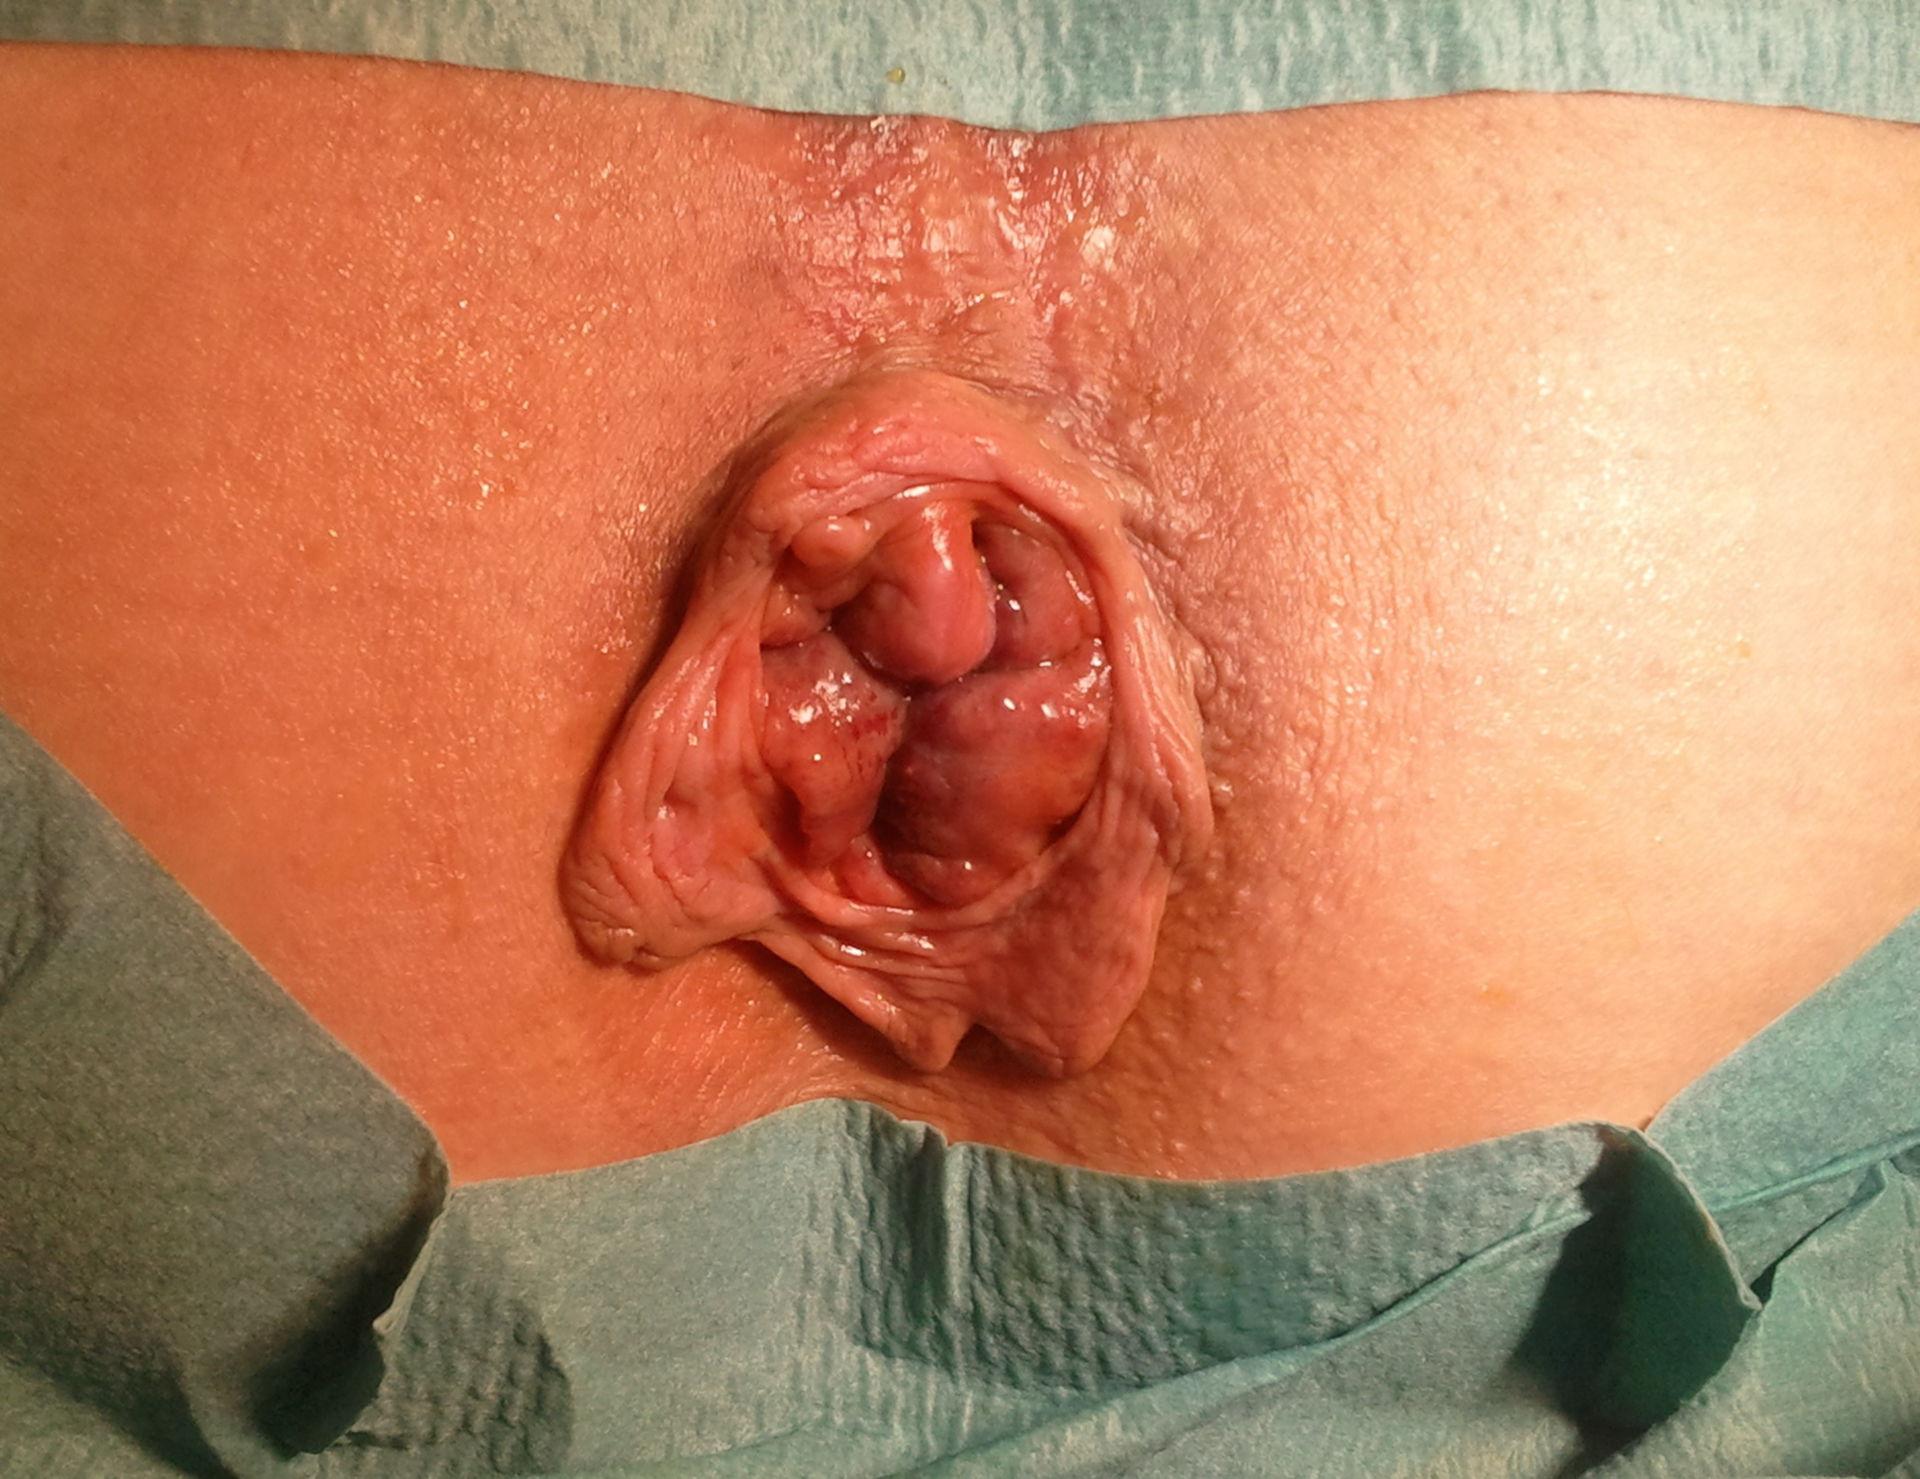 Hemorroids Stage III